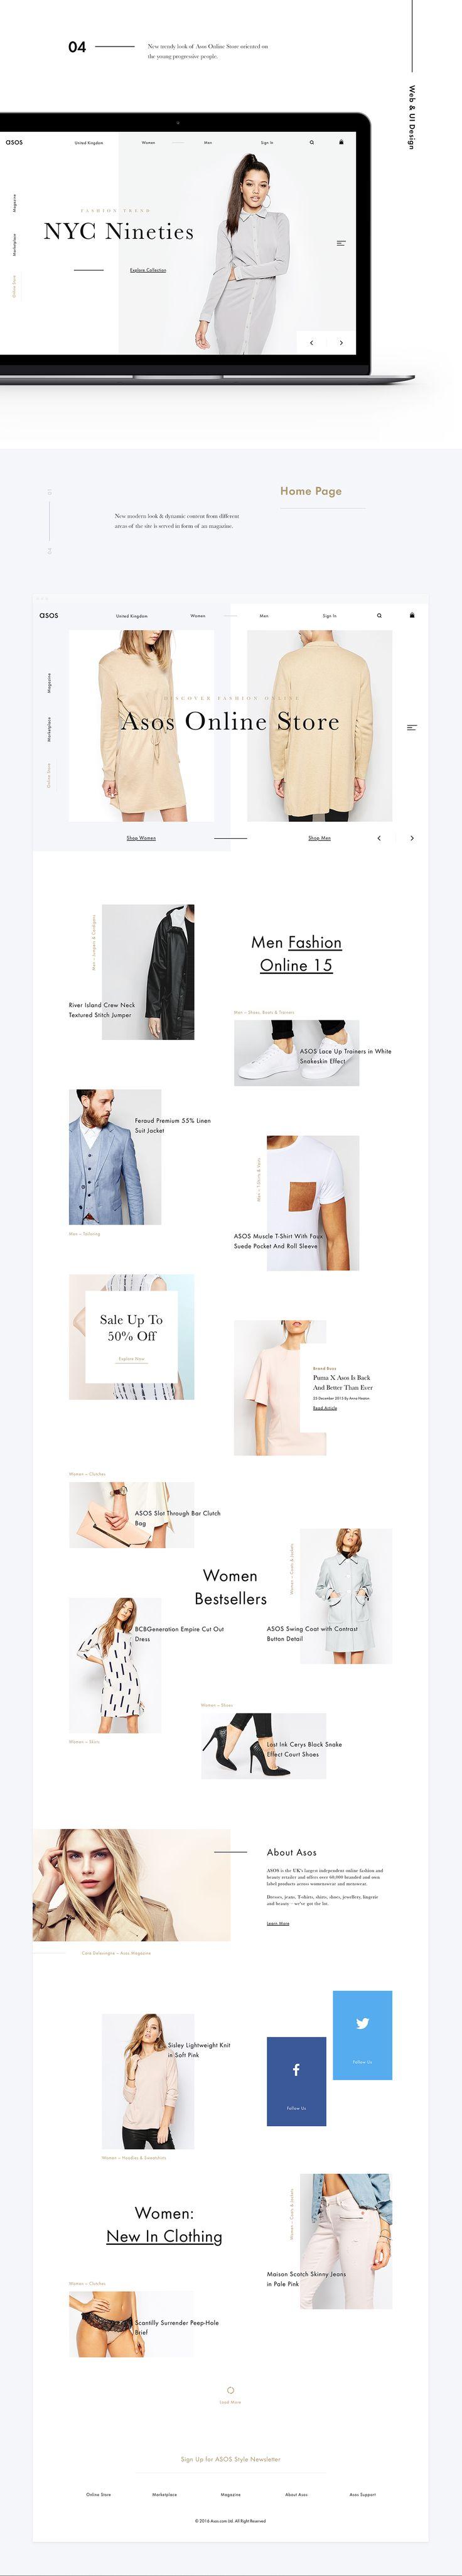 Asos. Redesign & Rethinking Concept on Web Design Served